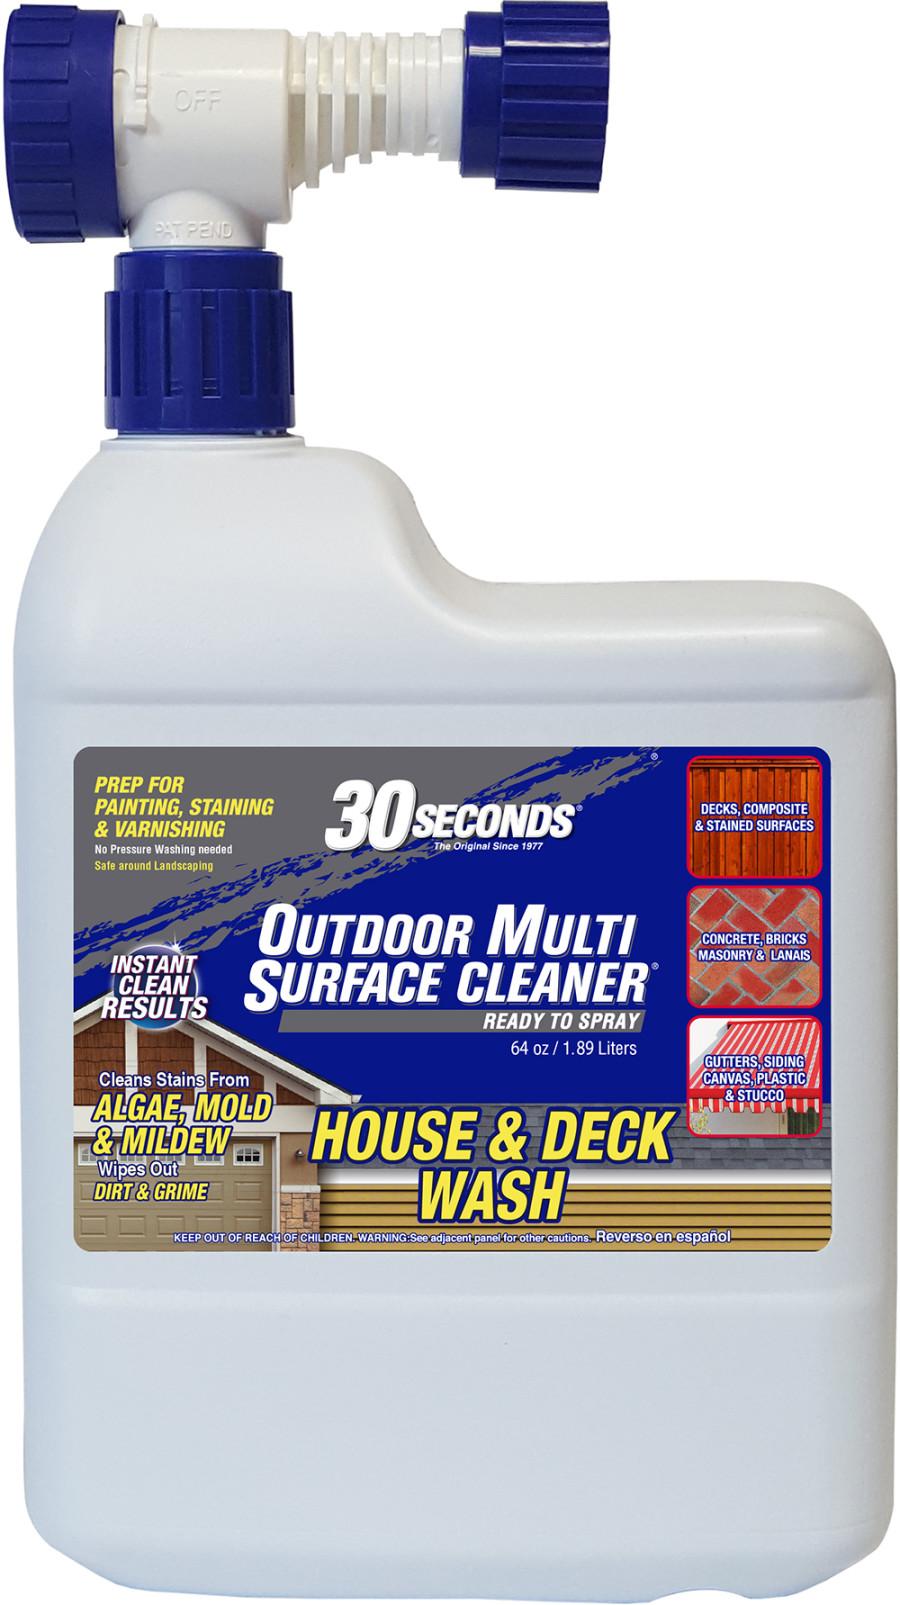 30 Seconds Outdoor Multi Surface Algae Mold & Mildew Cleaner Ready to Spray Floor Display Floor Display 45ea/64 oz